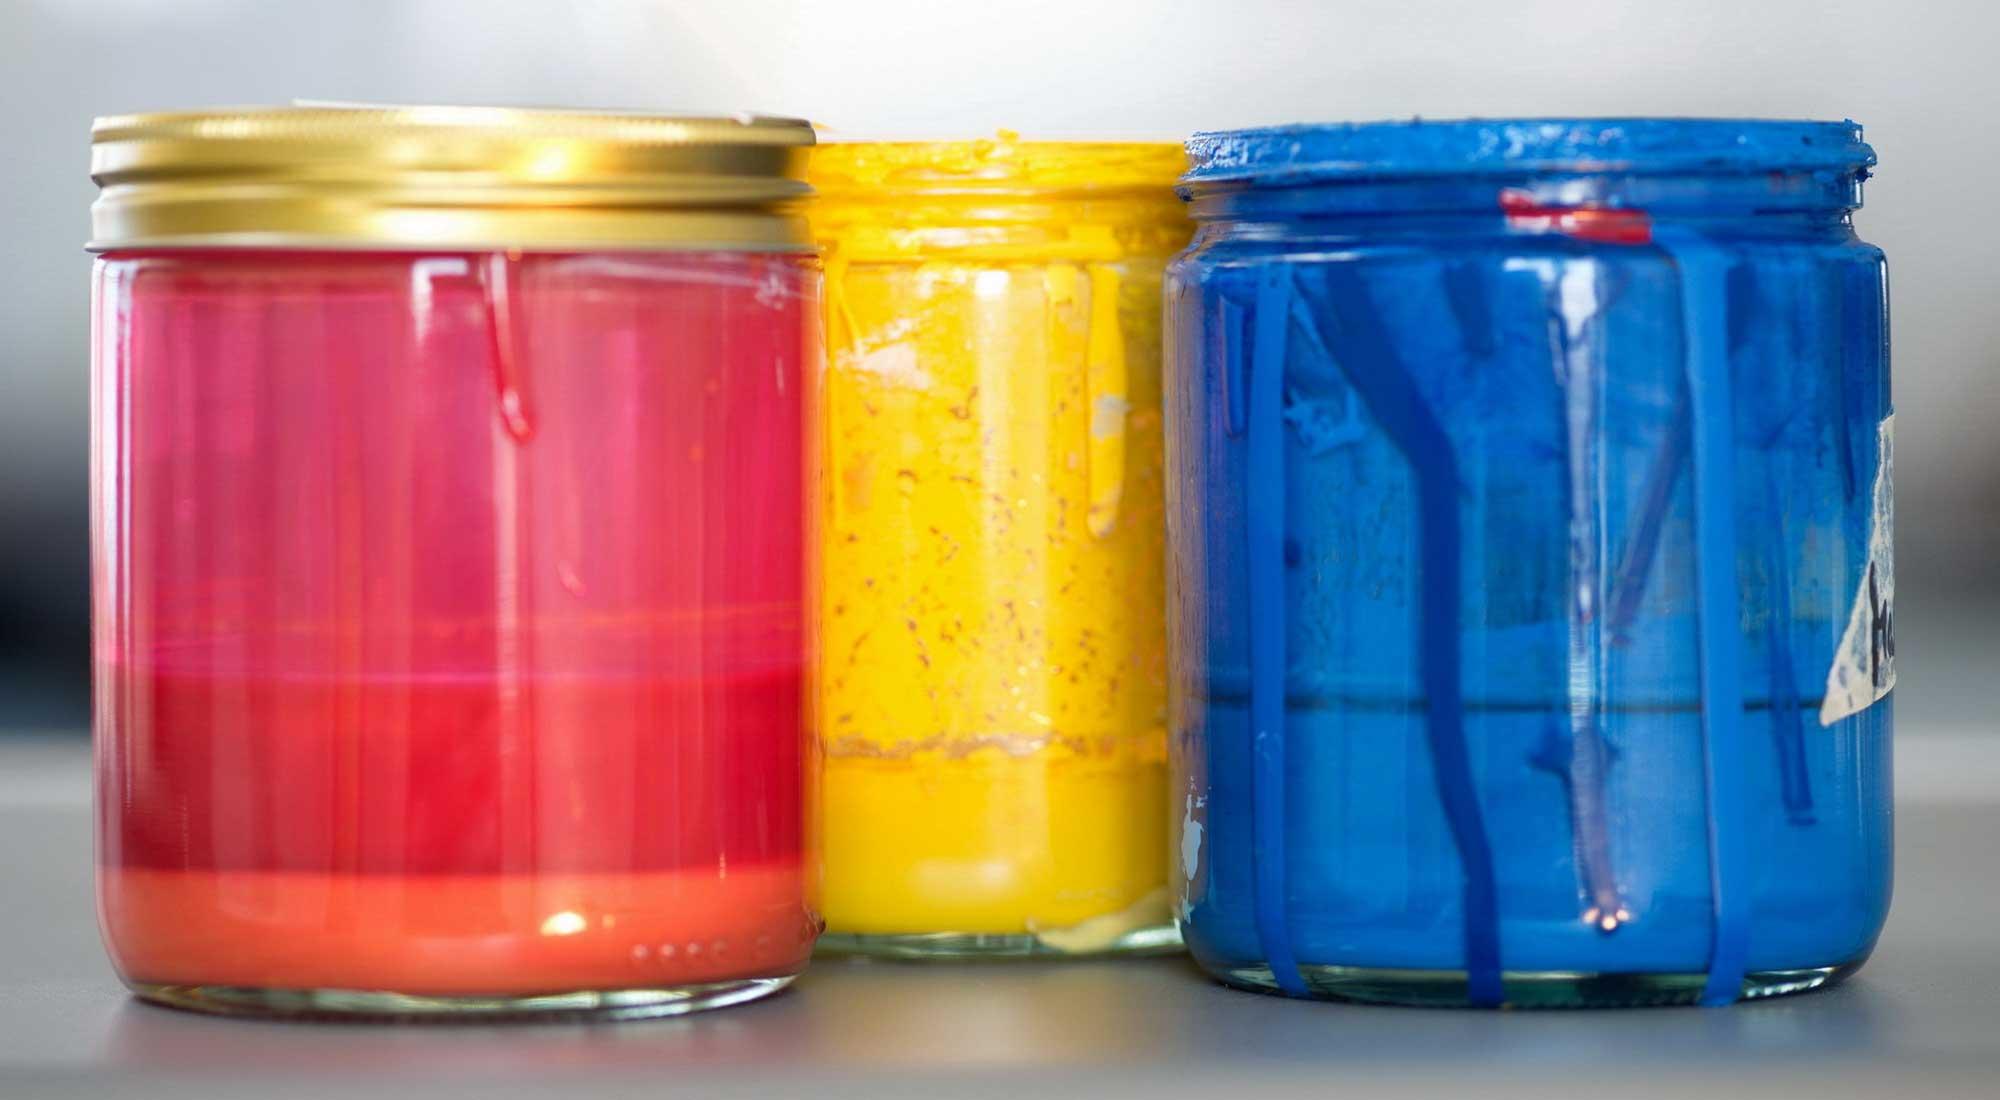 Siebdruckfarben © Atelier Haase - Foto: Hans-Heinrich Haase